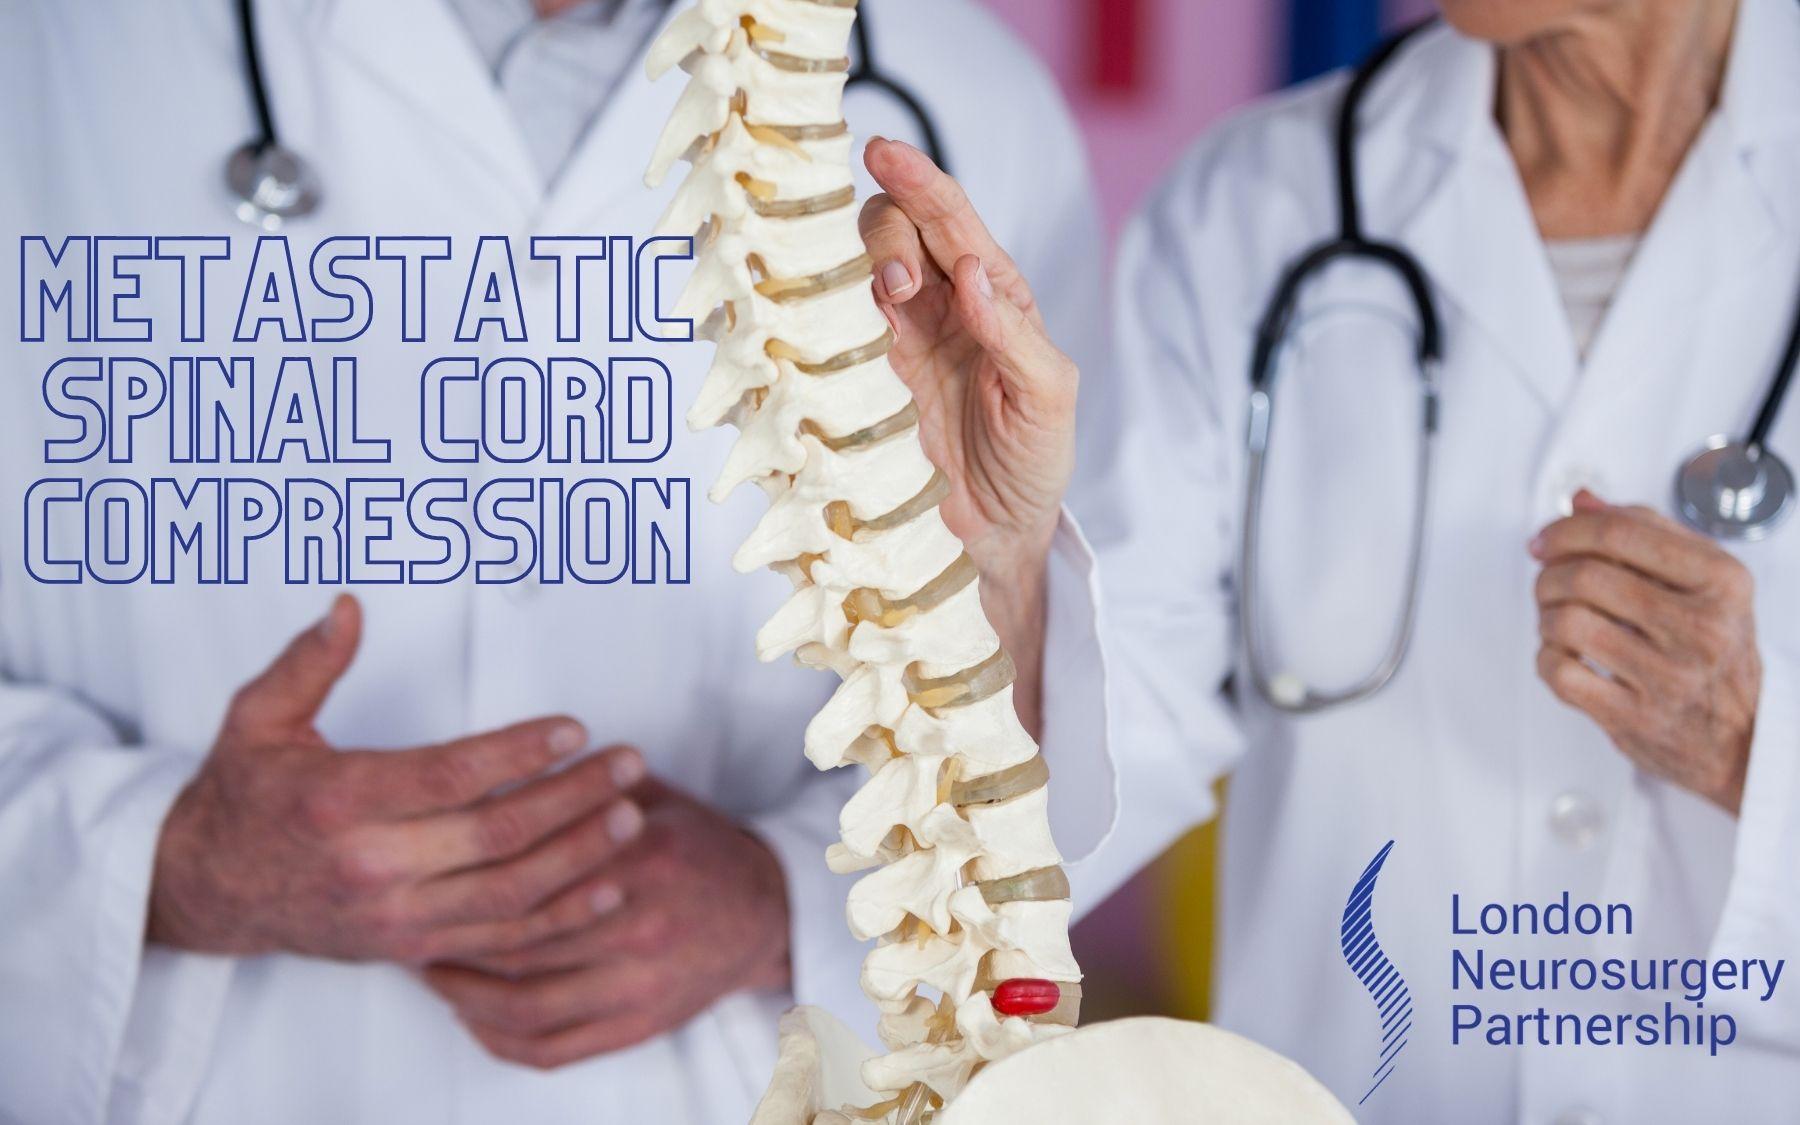 Metastatic spinal cord compression lnp